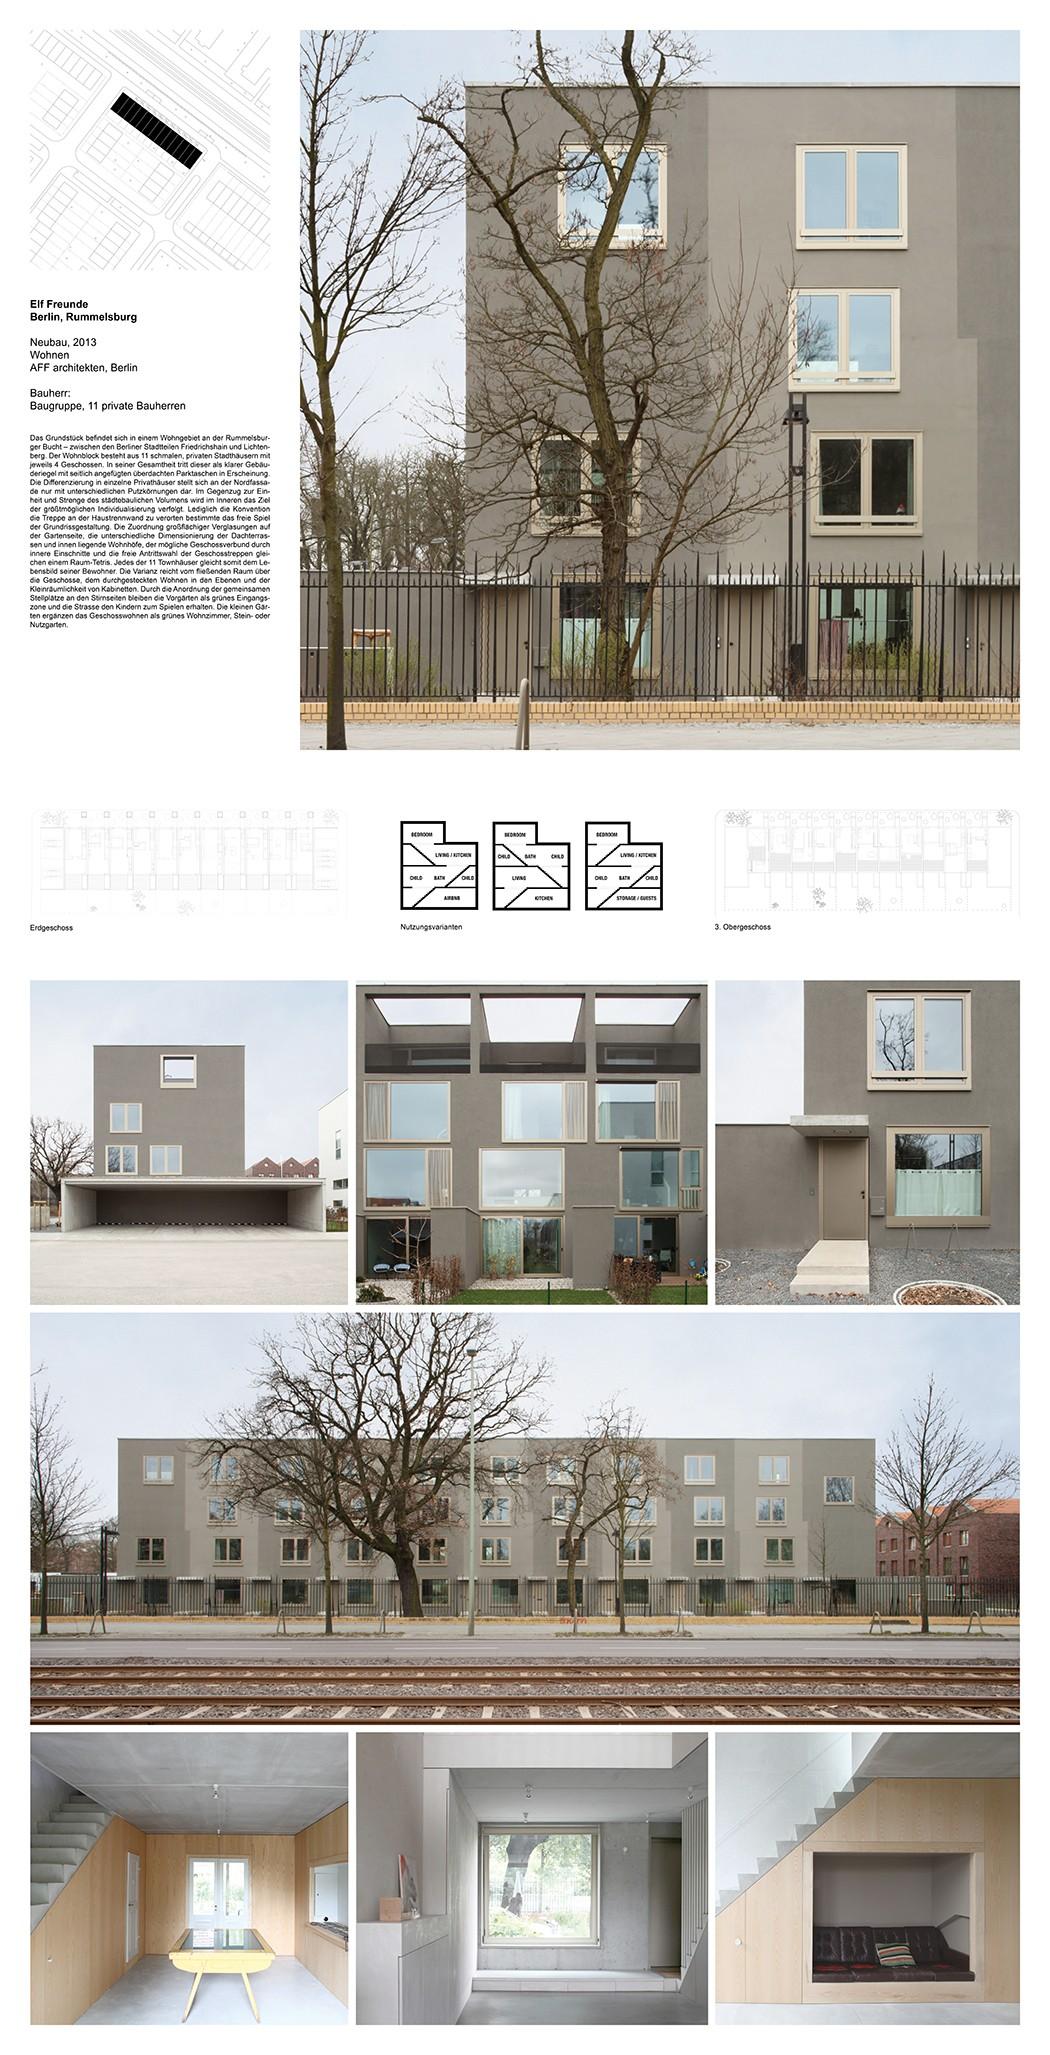 bda preis berlin 2018 publikumspreis 2018 bda berlin publikumspreis. Black Bedroom Furniture Sets. Home Design Ideas